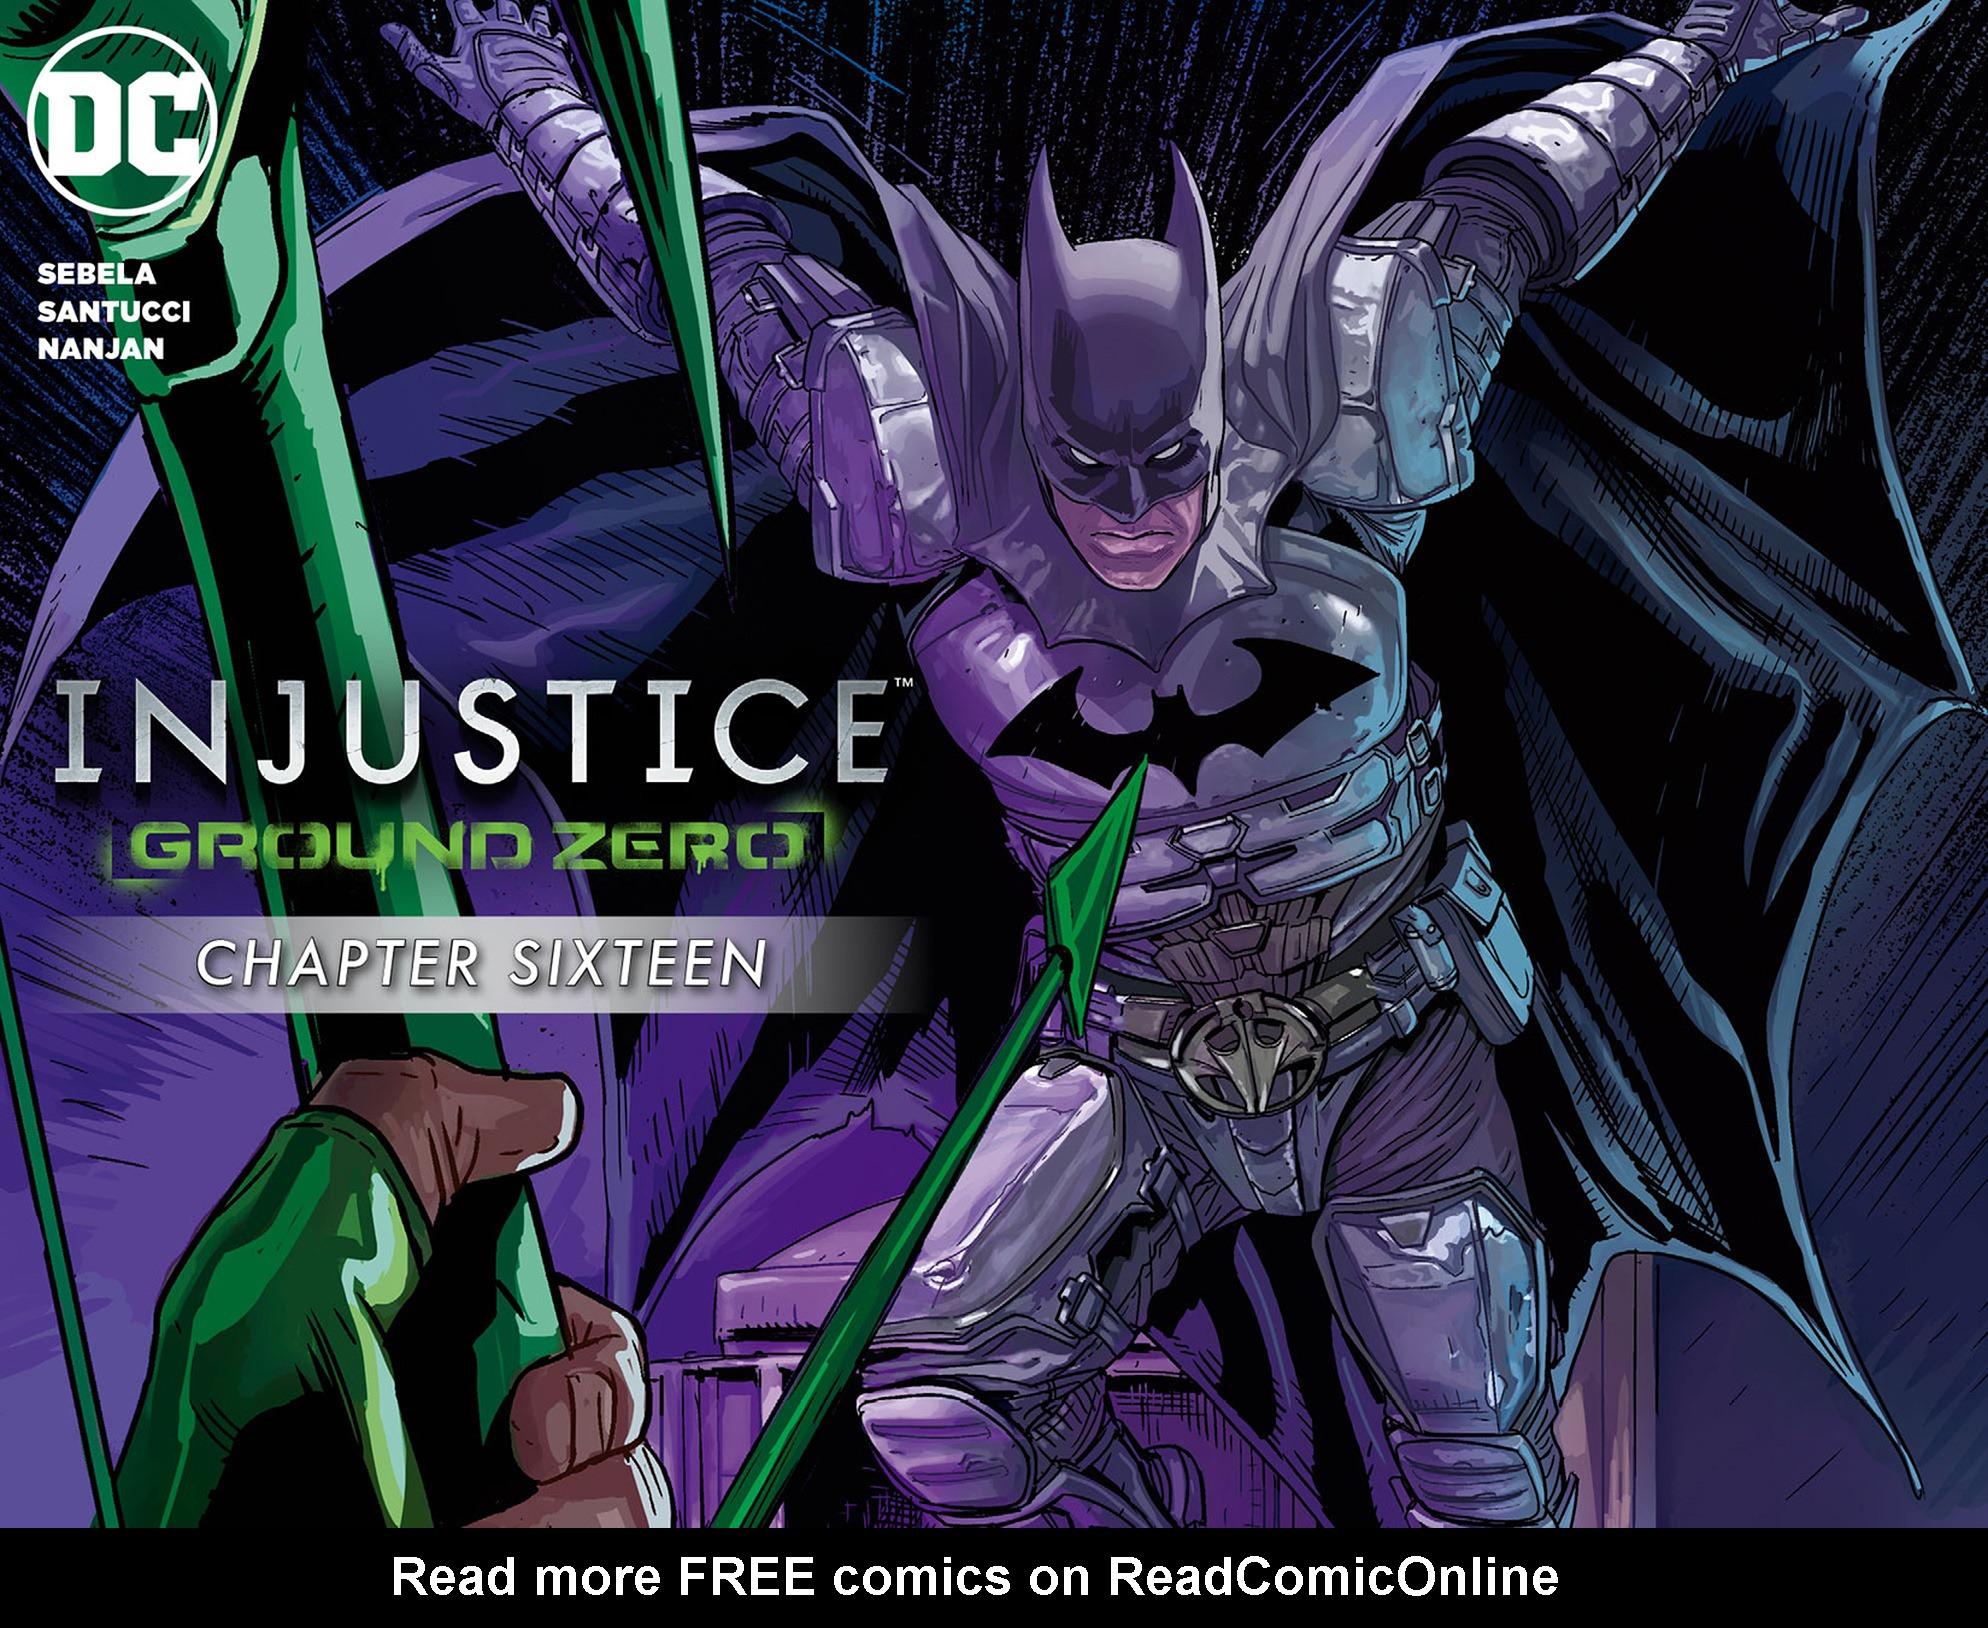 Read online Injustice: Ground Zero comic -  Issue #16 - 1